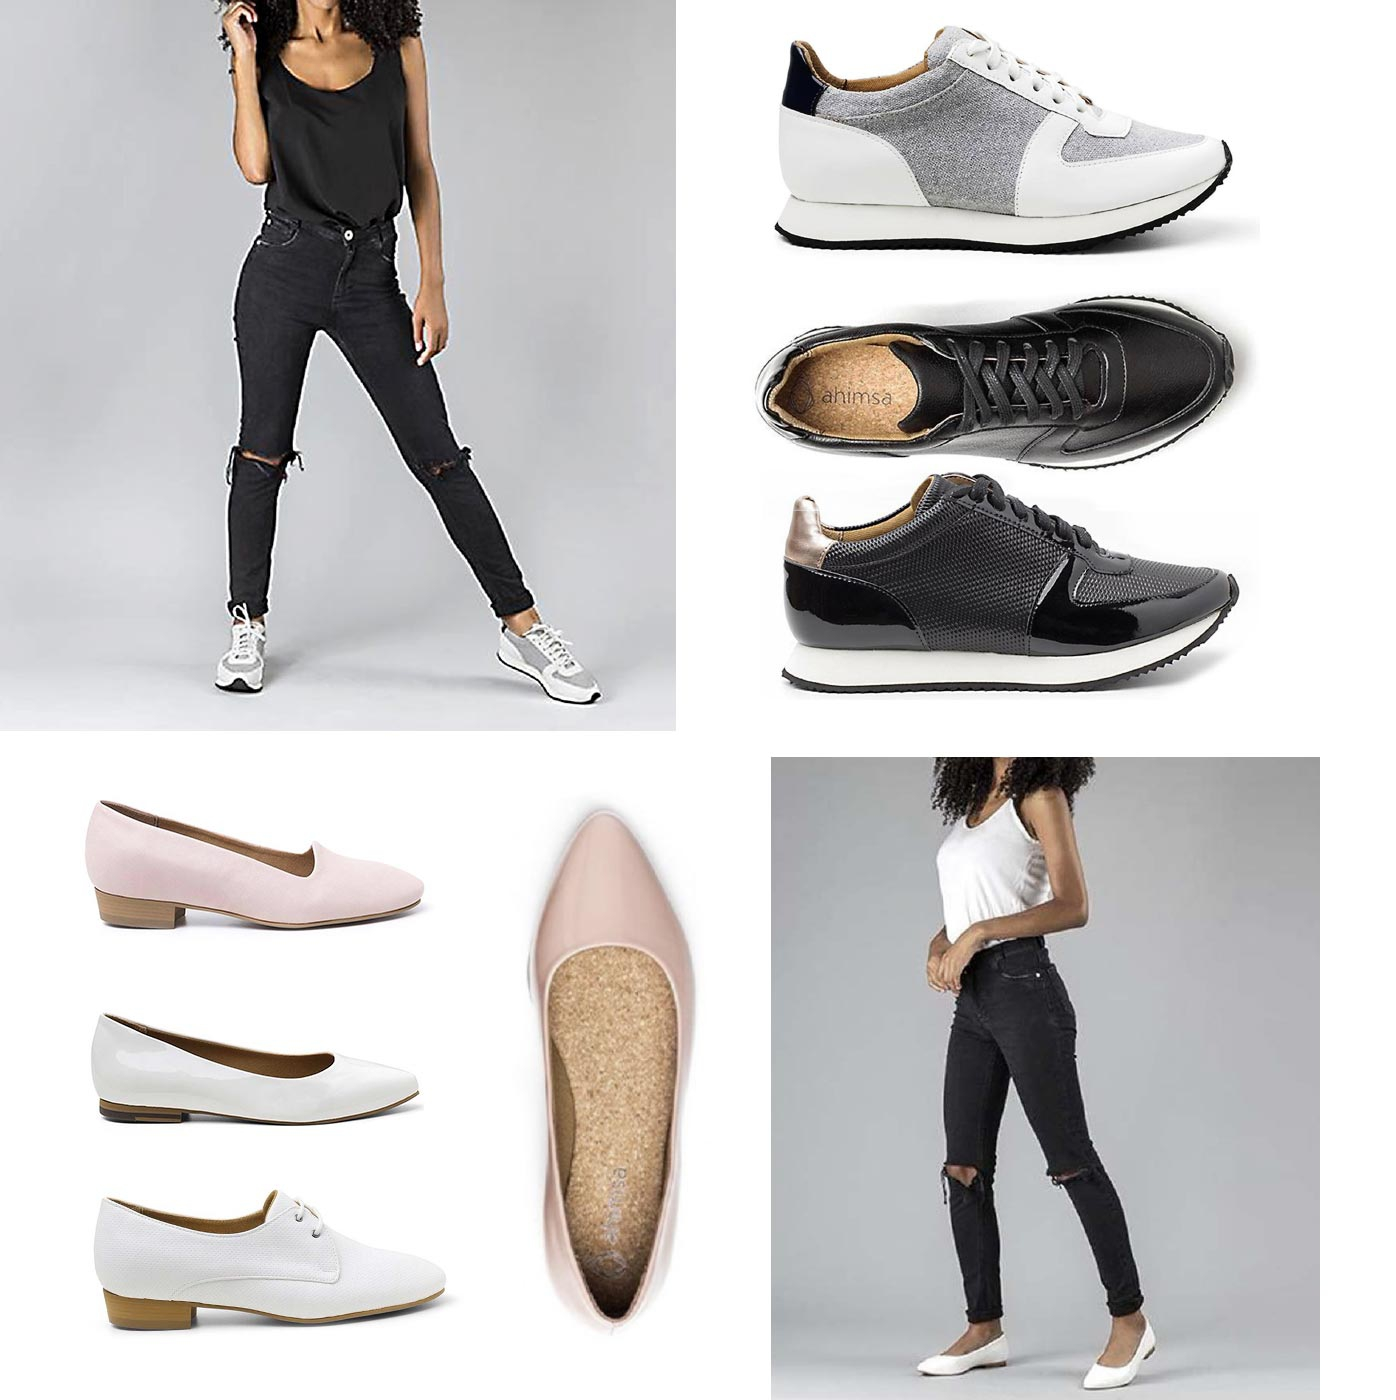 NEU   Vegane Sneaker und Schuhe von AHIMSA jetzt shoppen!